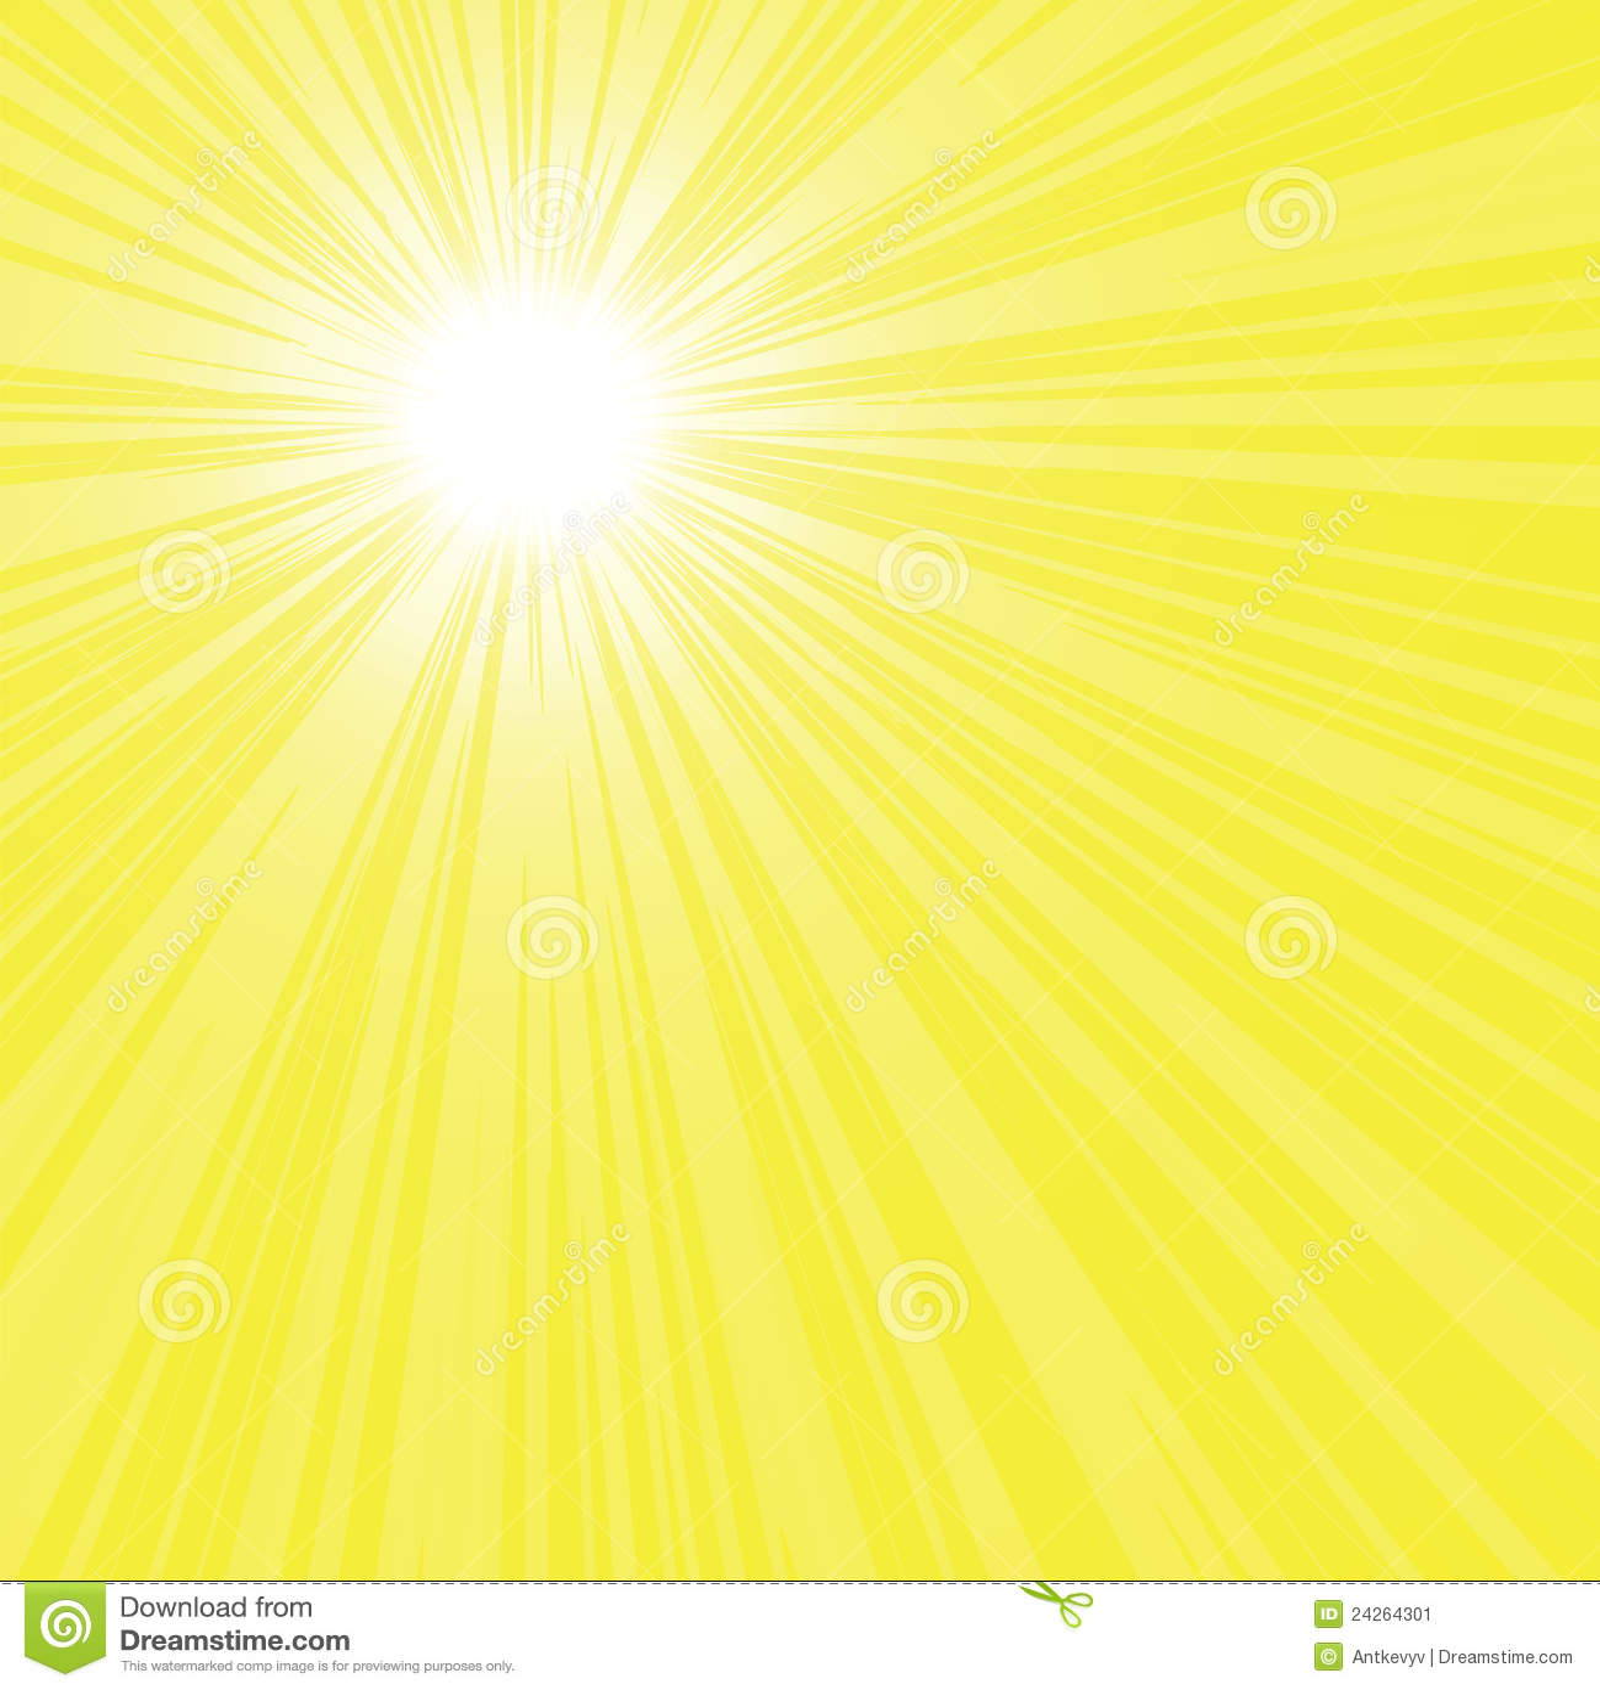 yellow rays vector - photo #44